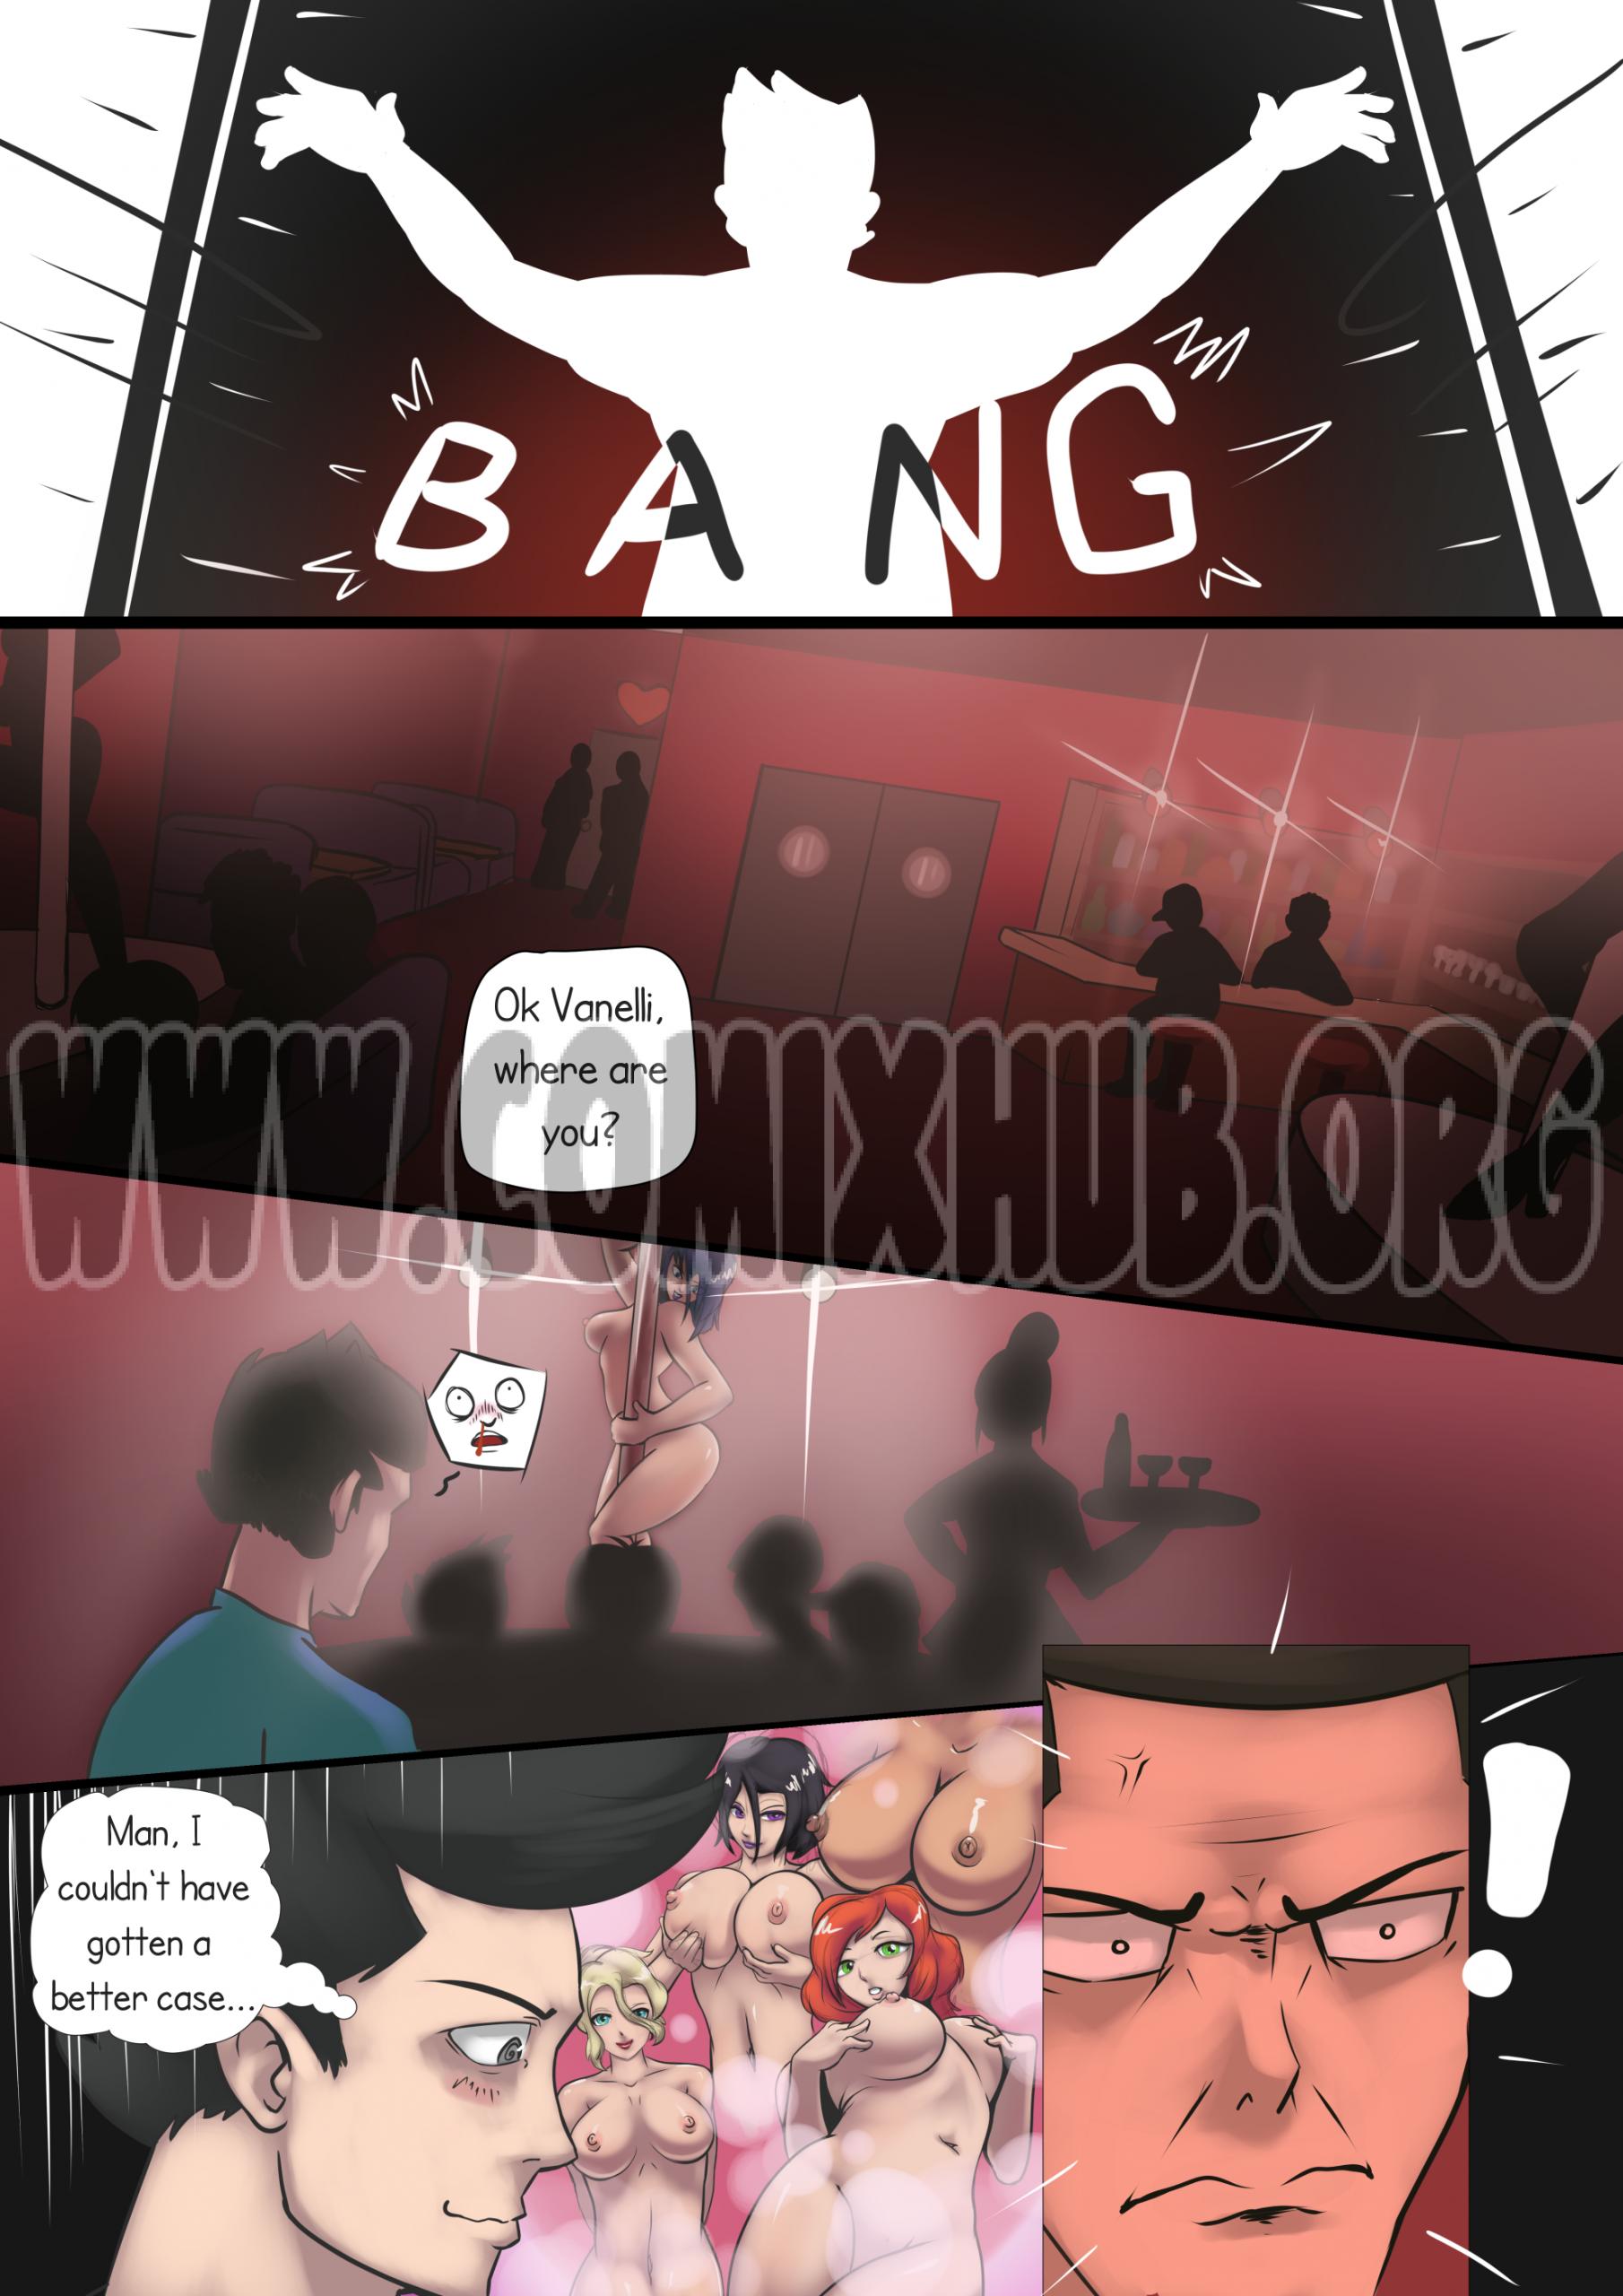 Porn comics Honeypot - Pokemon Oral sex, Anal Sex, BDSM, Bestiality, Big Tits, Blowjob, Bondage, Creampie, Fantasy, Femdom, fingering, Furry, Masturbation, Monster Girls, Rape, Straight, Titfuck, X-Ray